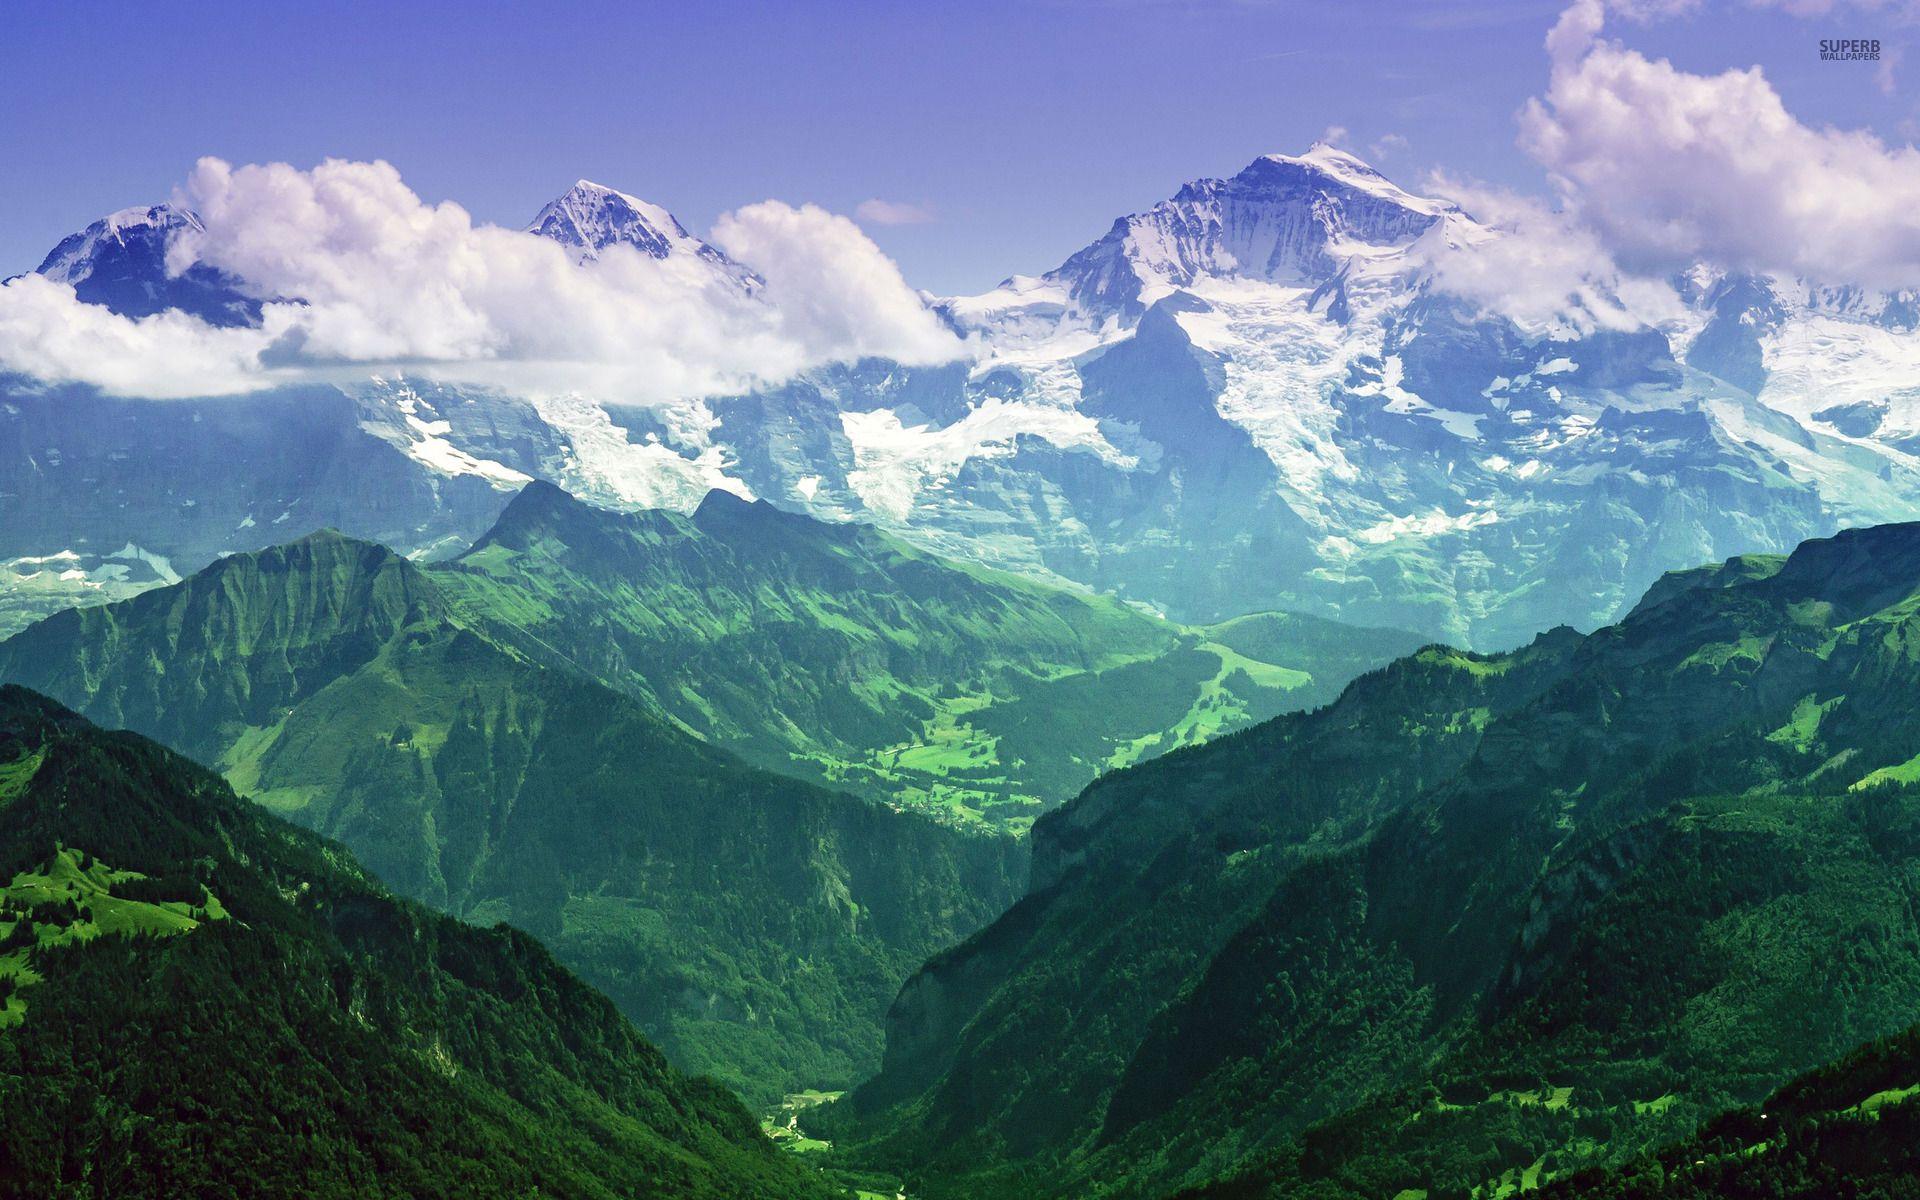 Live Switzerland Wallpapers Switzerland Wallpapers Collection Switzerland Wallpaper Hd Nature Wallpapers Landscape Wallpaper